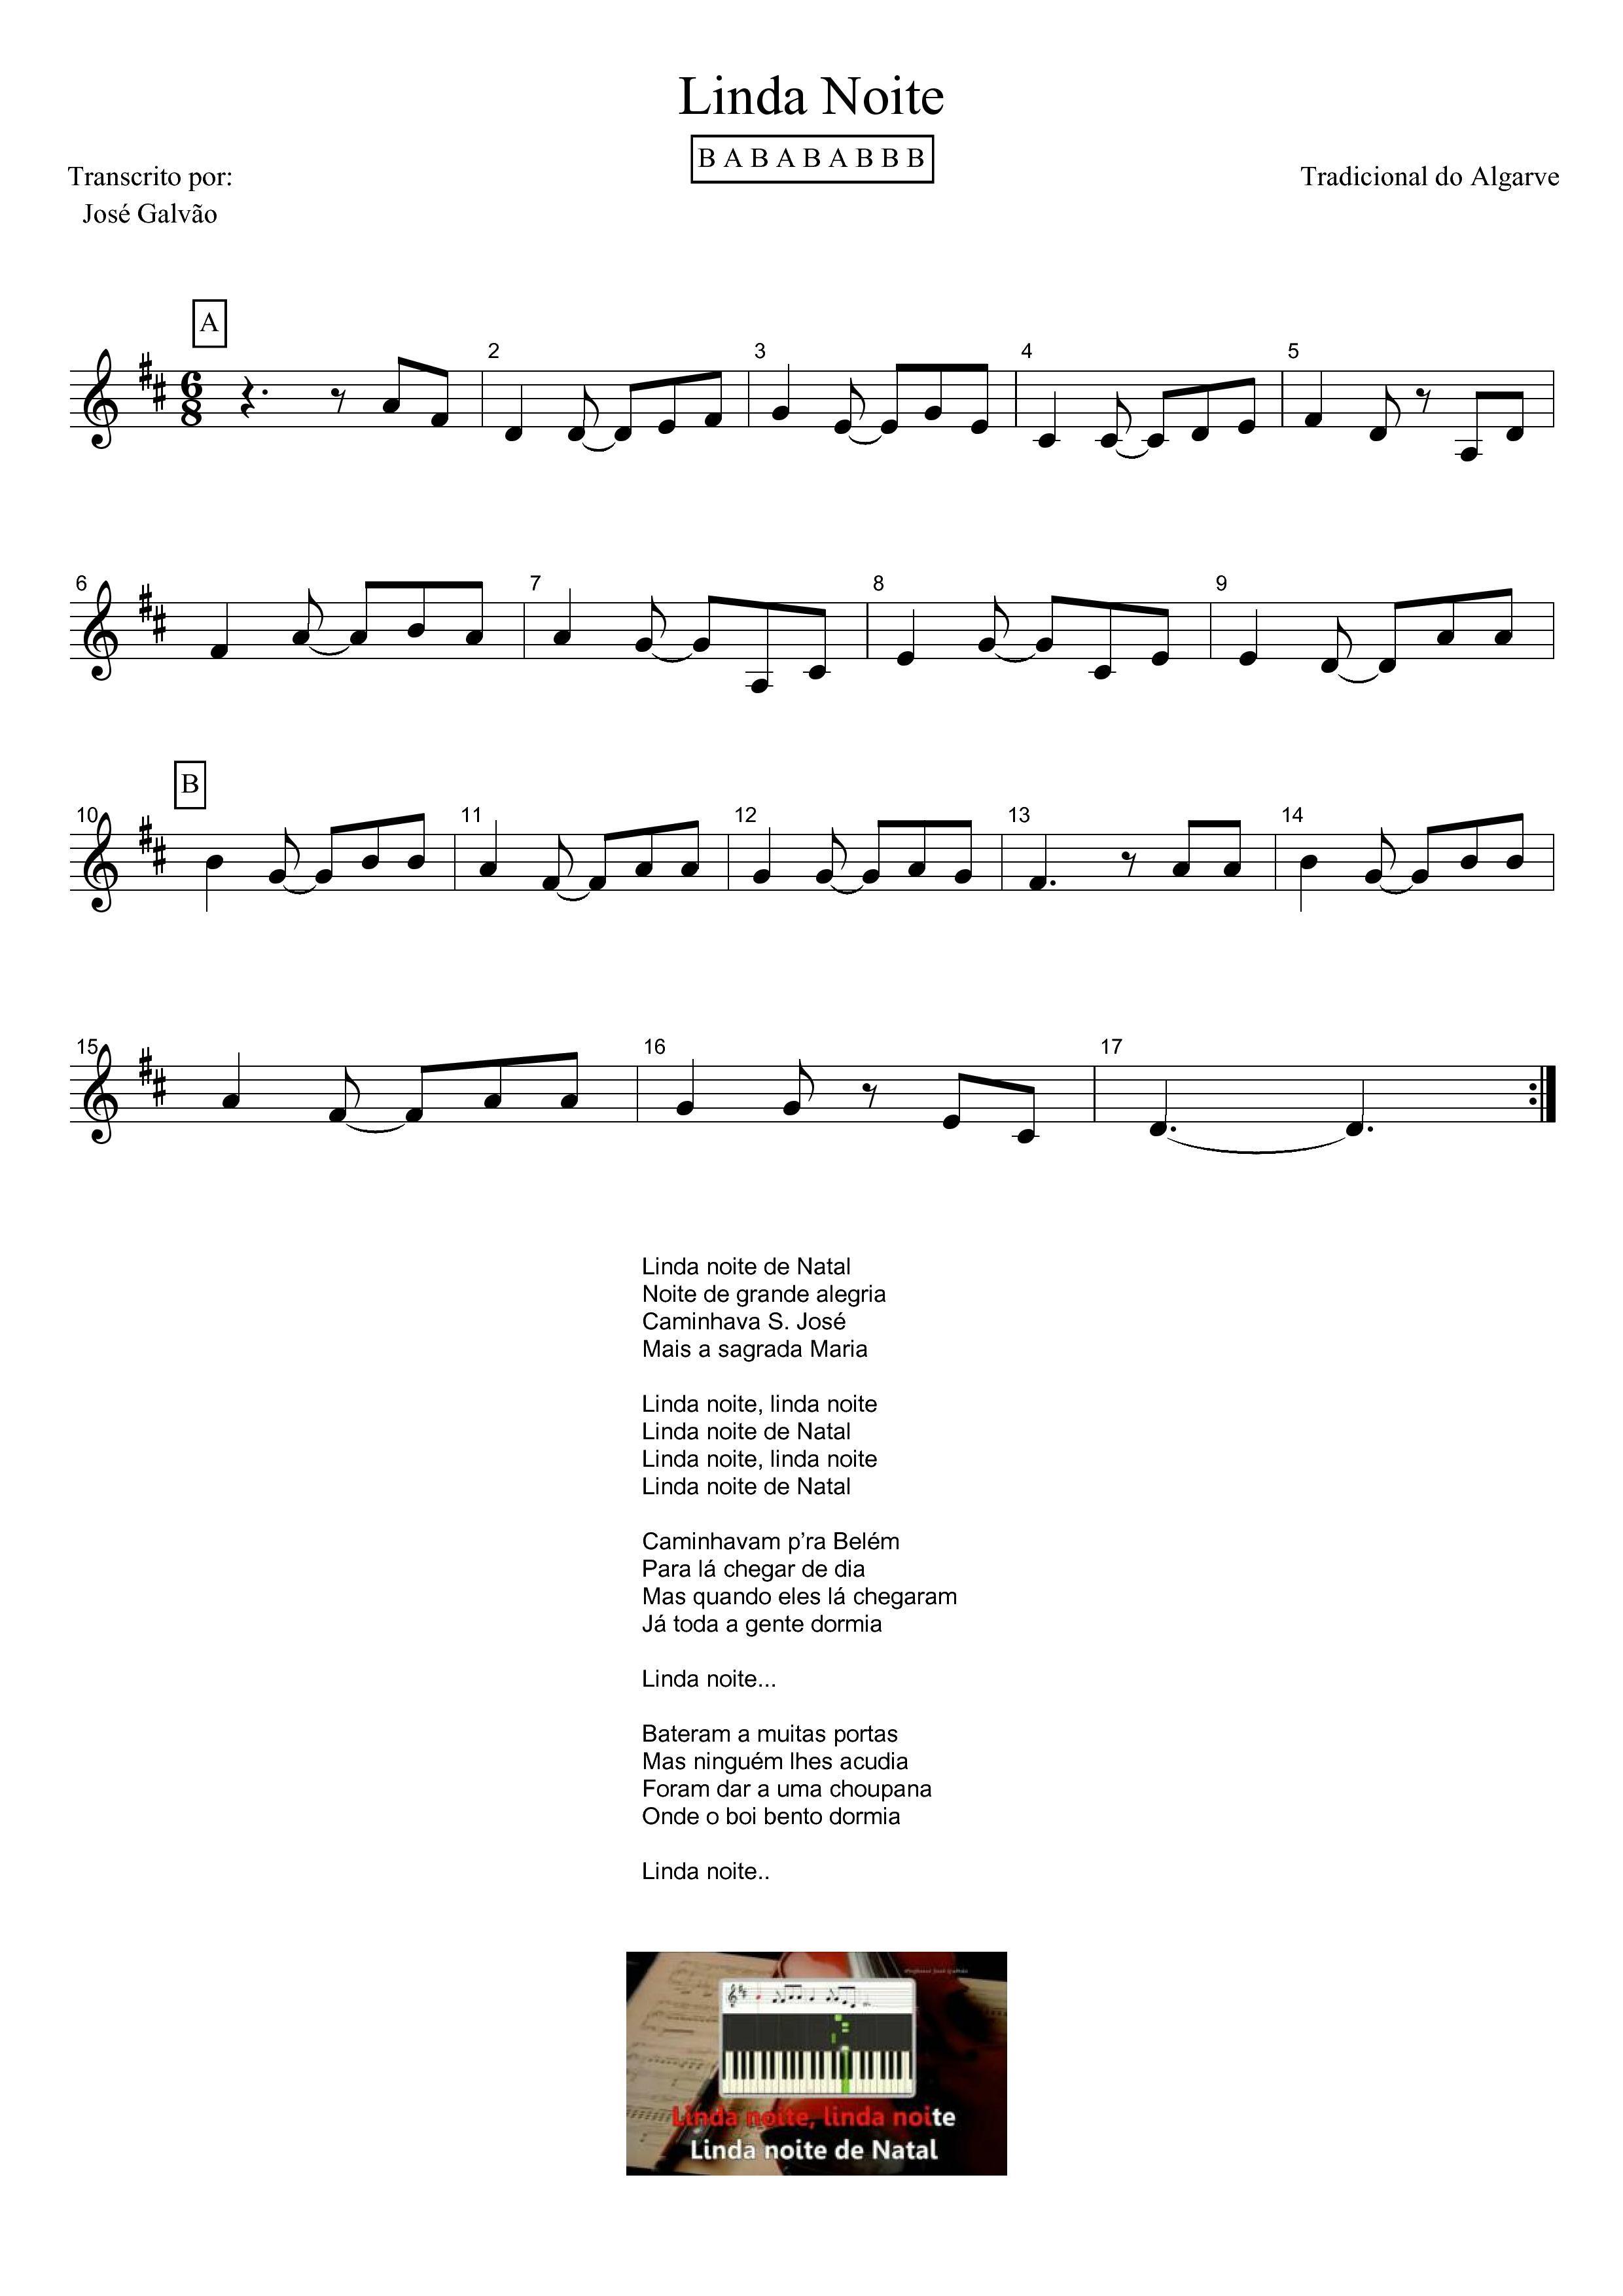 Linda Noite: partitura e letra.